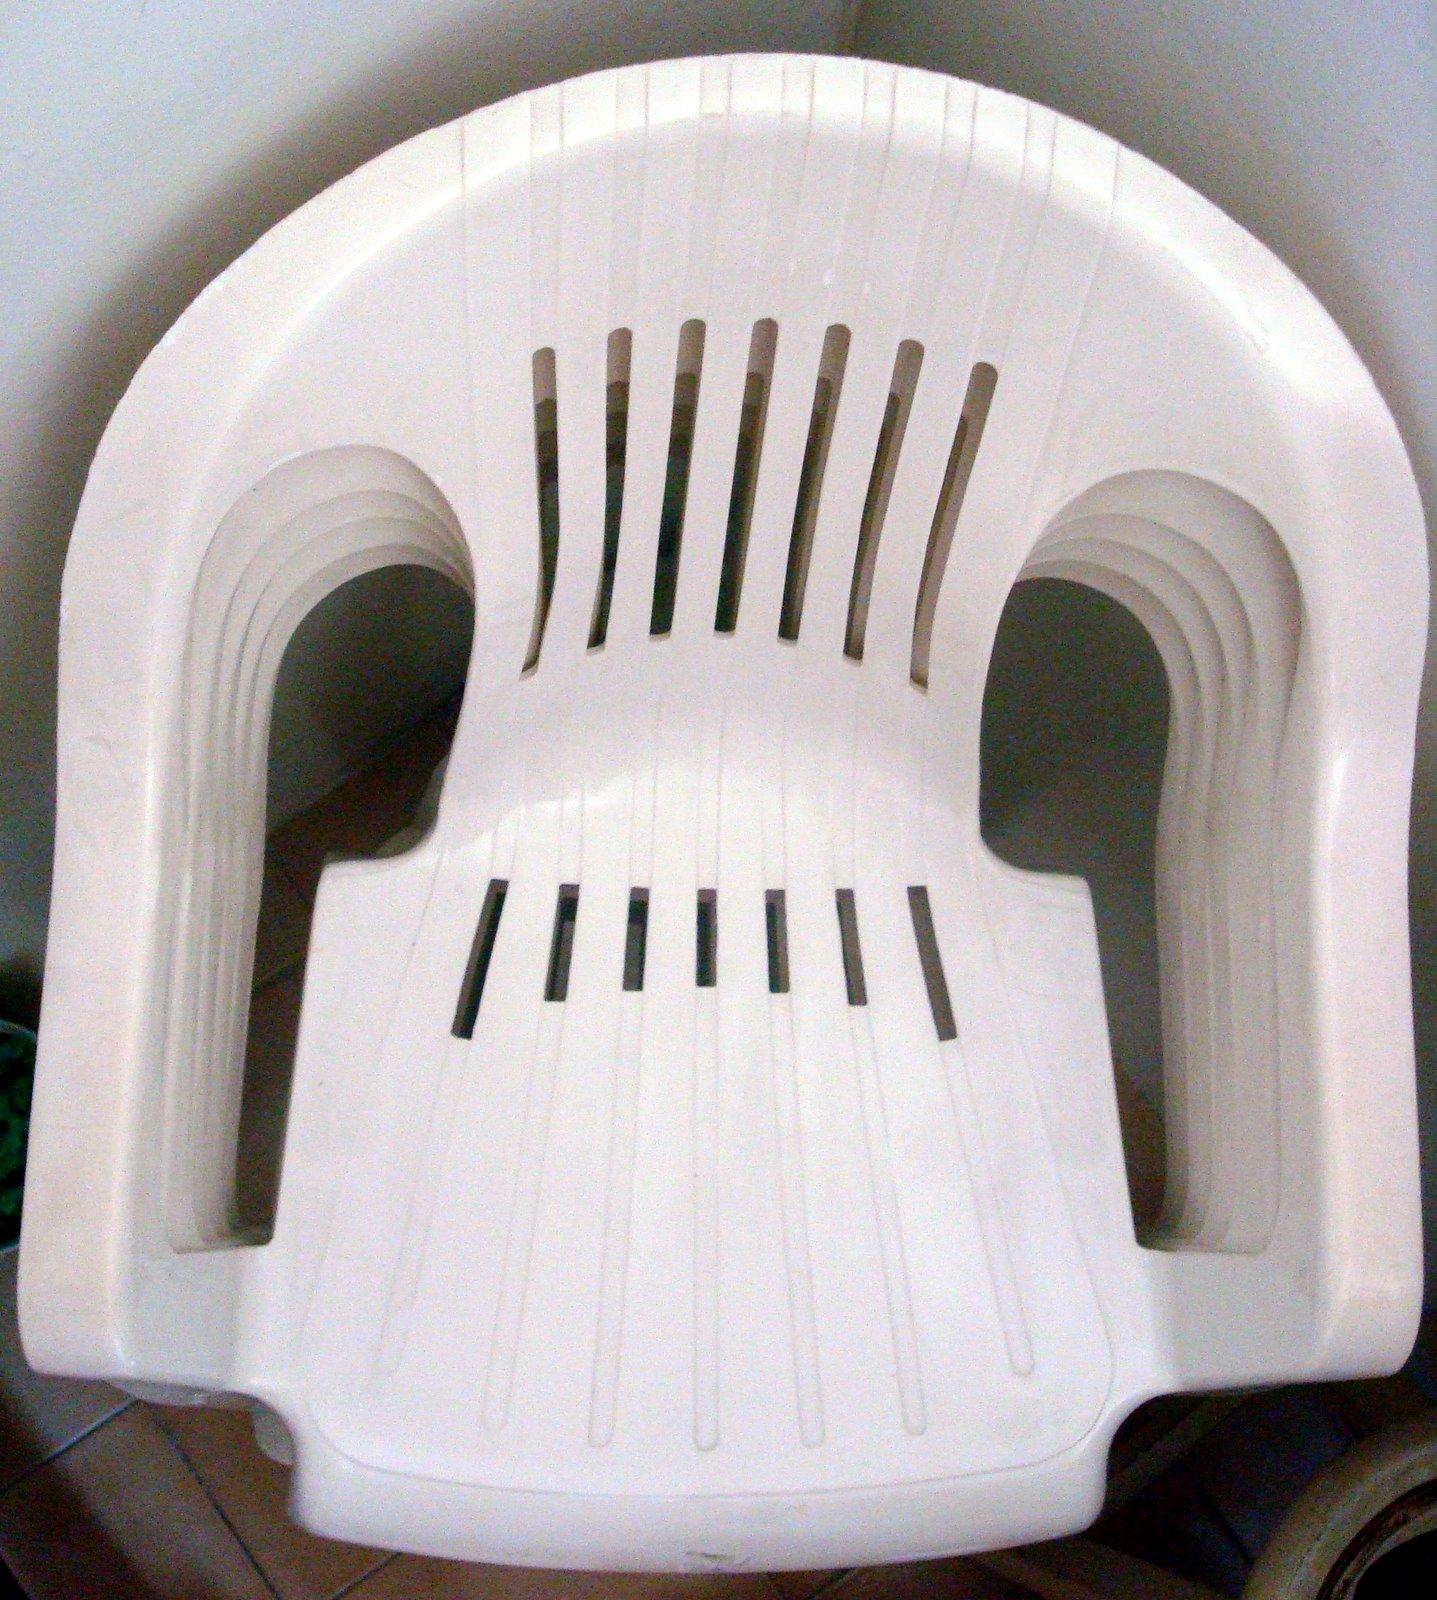 Bazar Cad: Cadeiras de Plástico (4 unidades) #5C493F 1437x1600